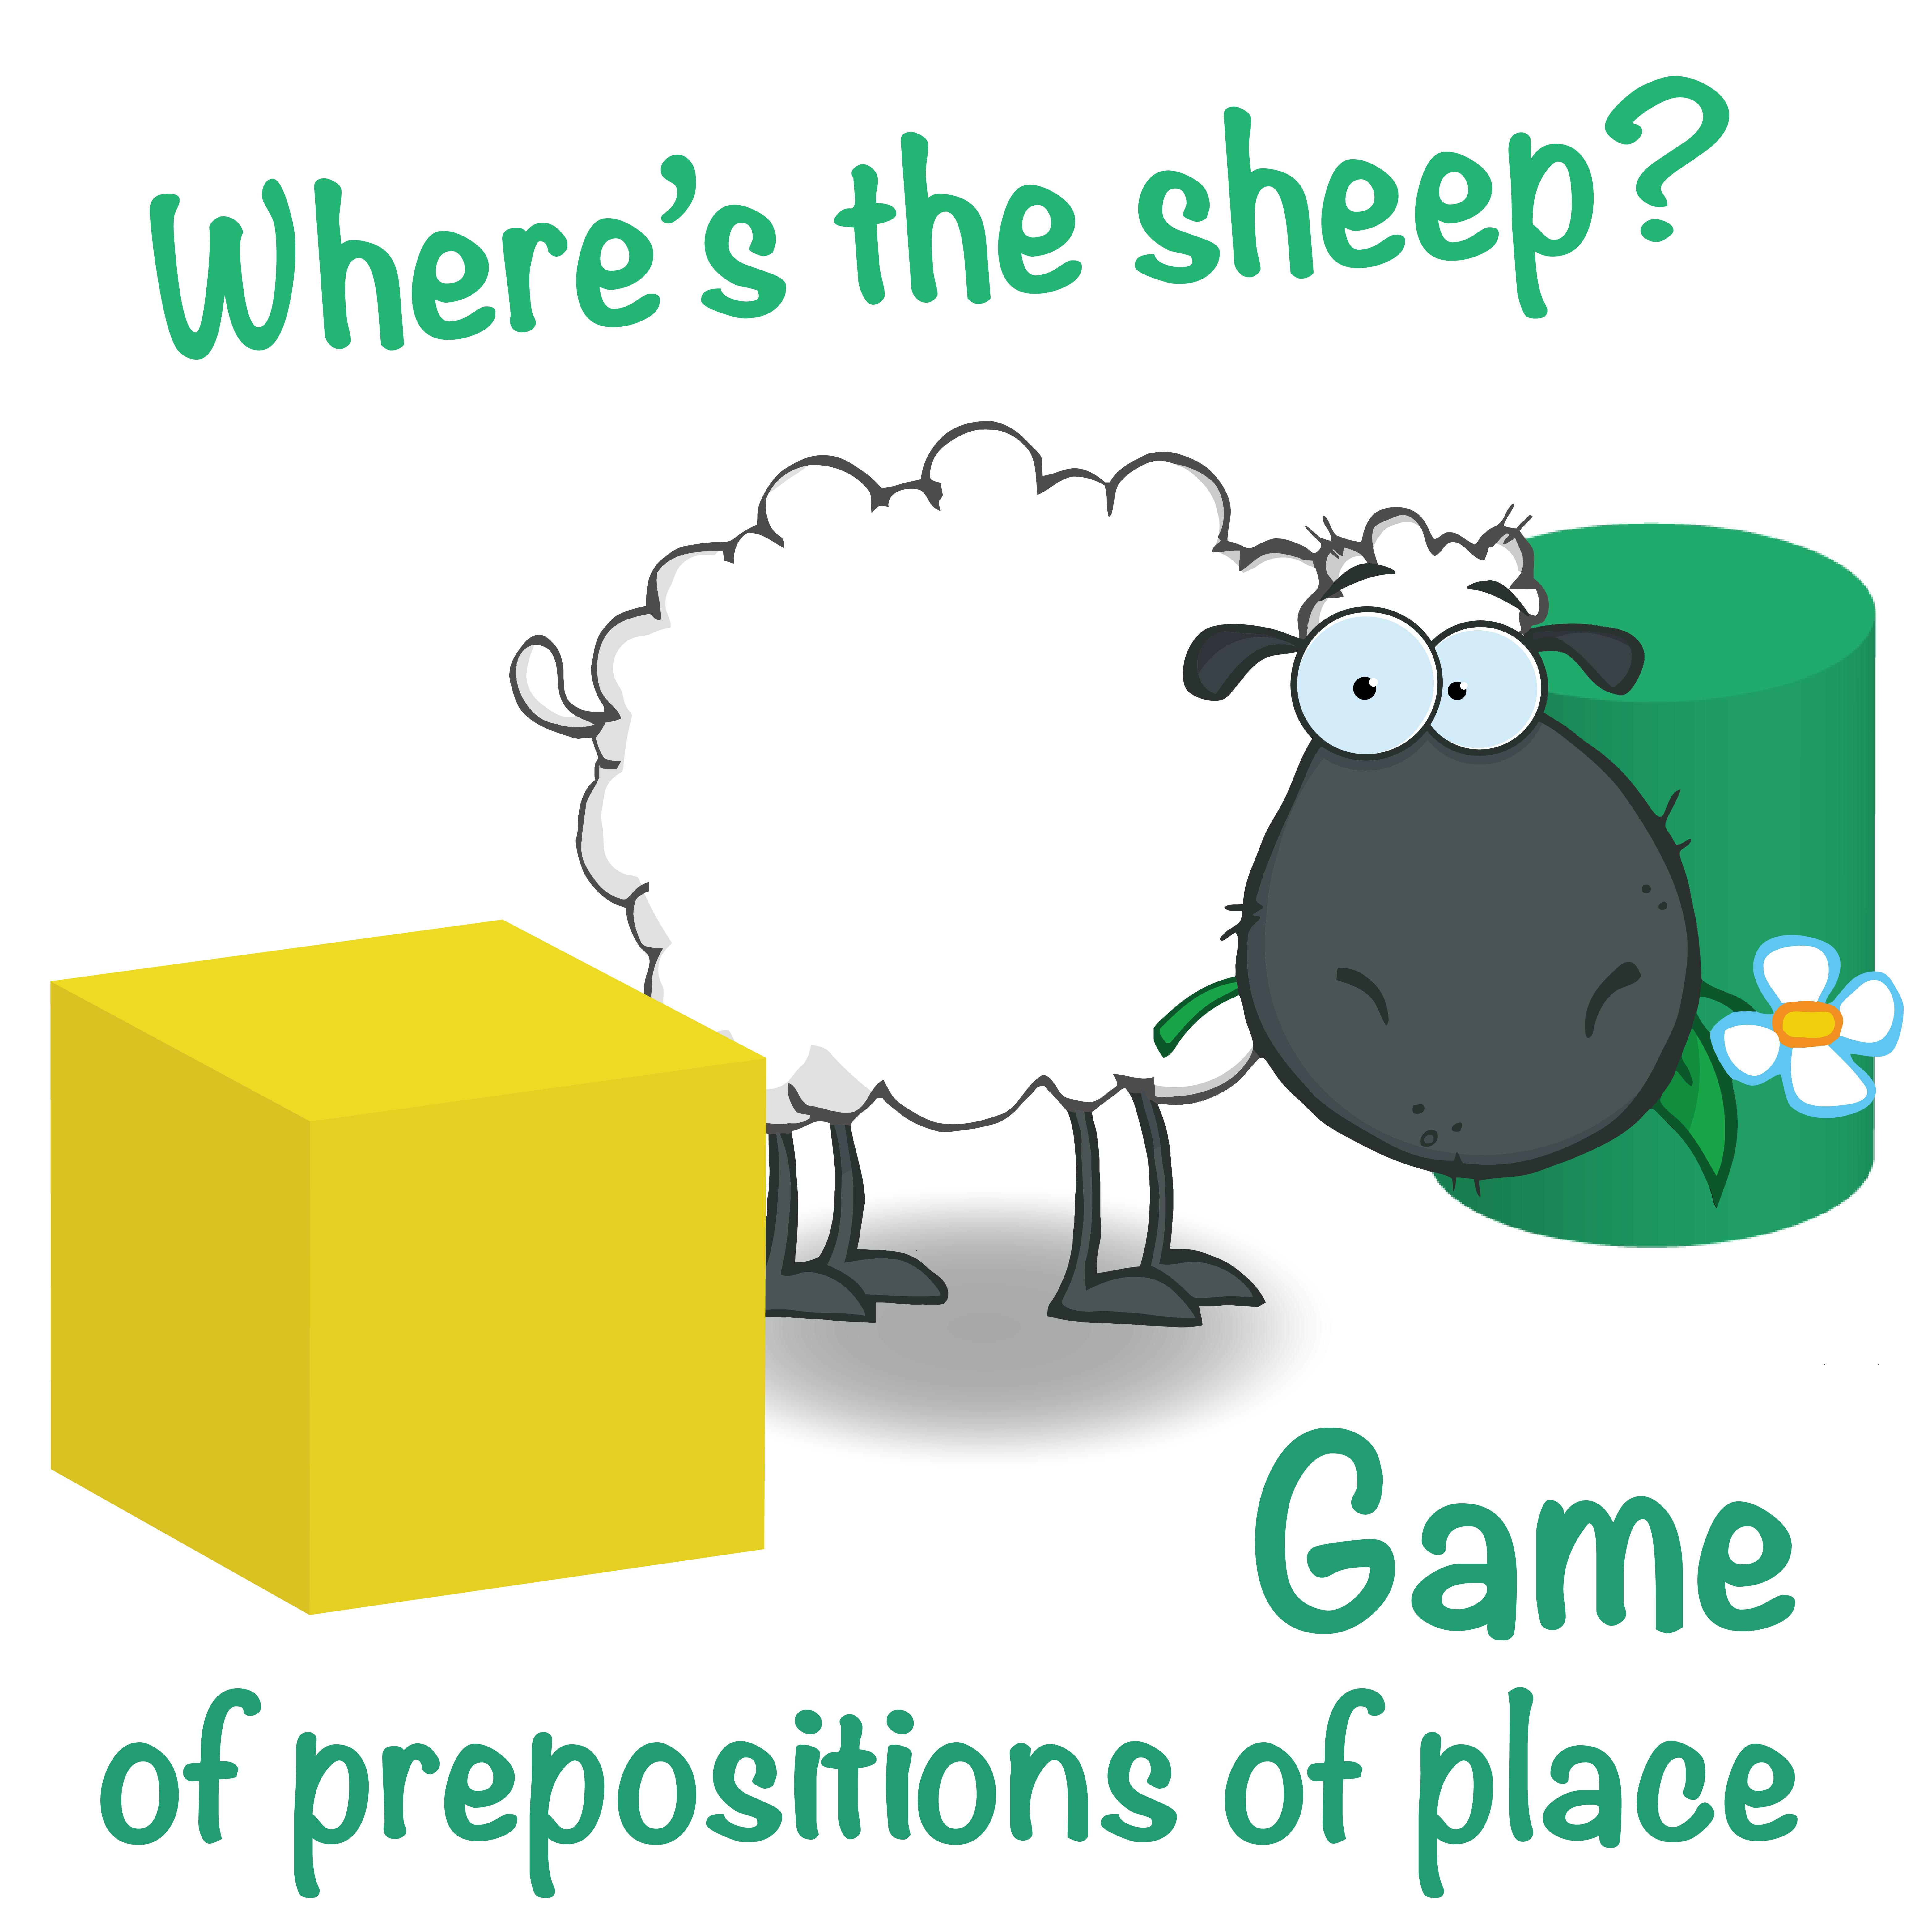 esl-expertz-esl-english-teaching-resource-for-teachers-prepositions-of-place-game-logo